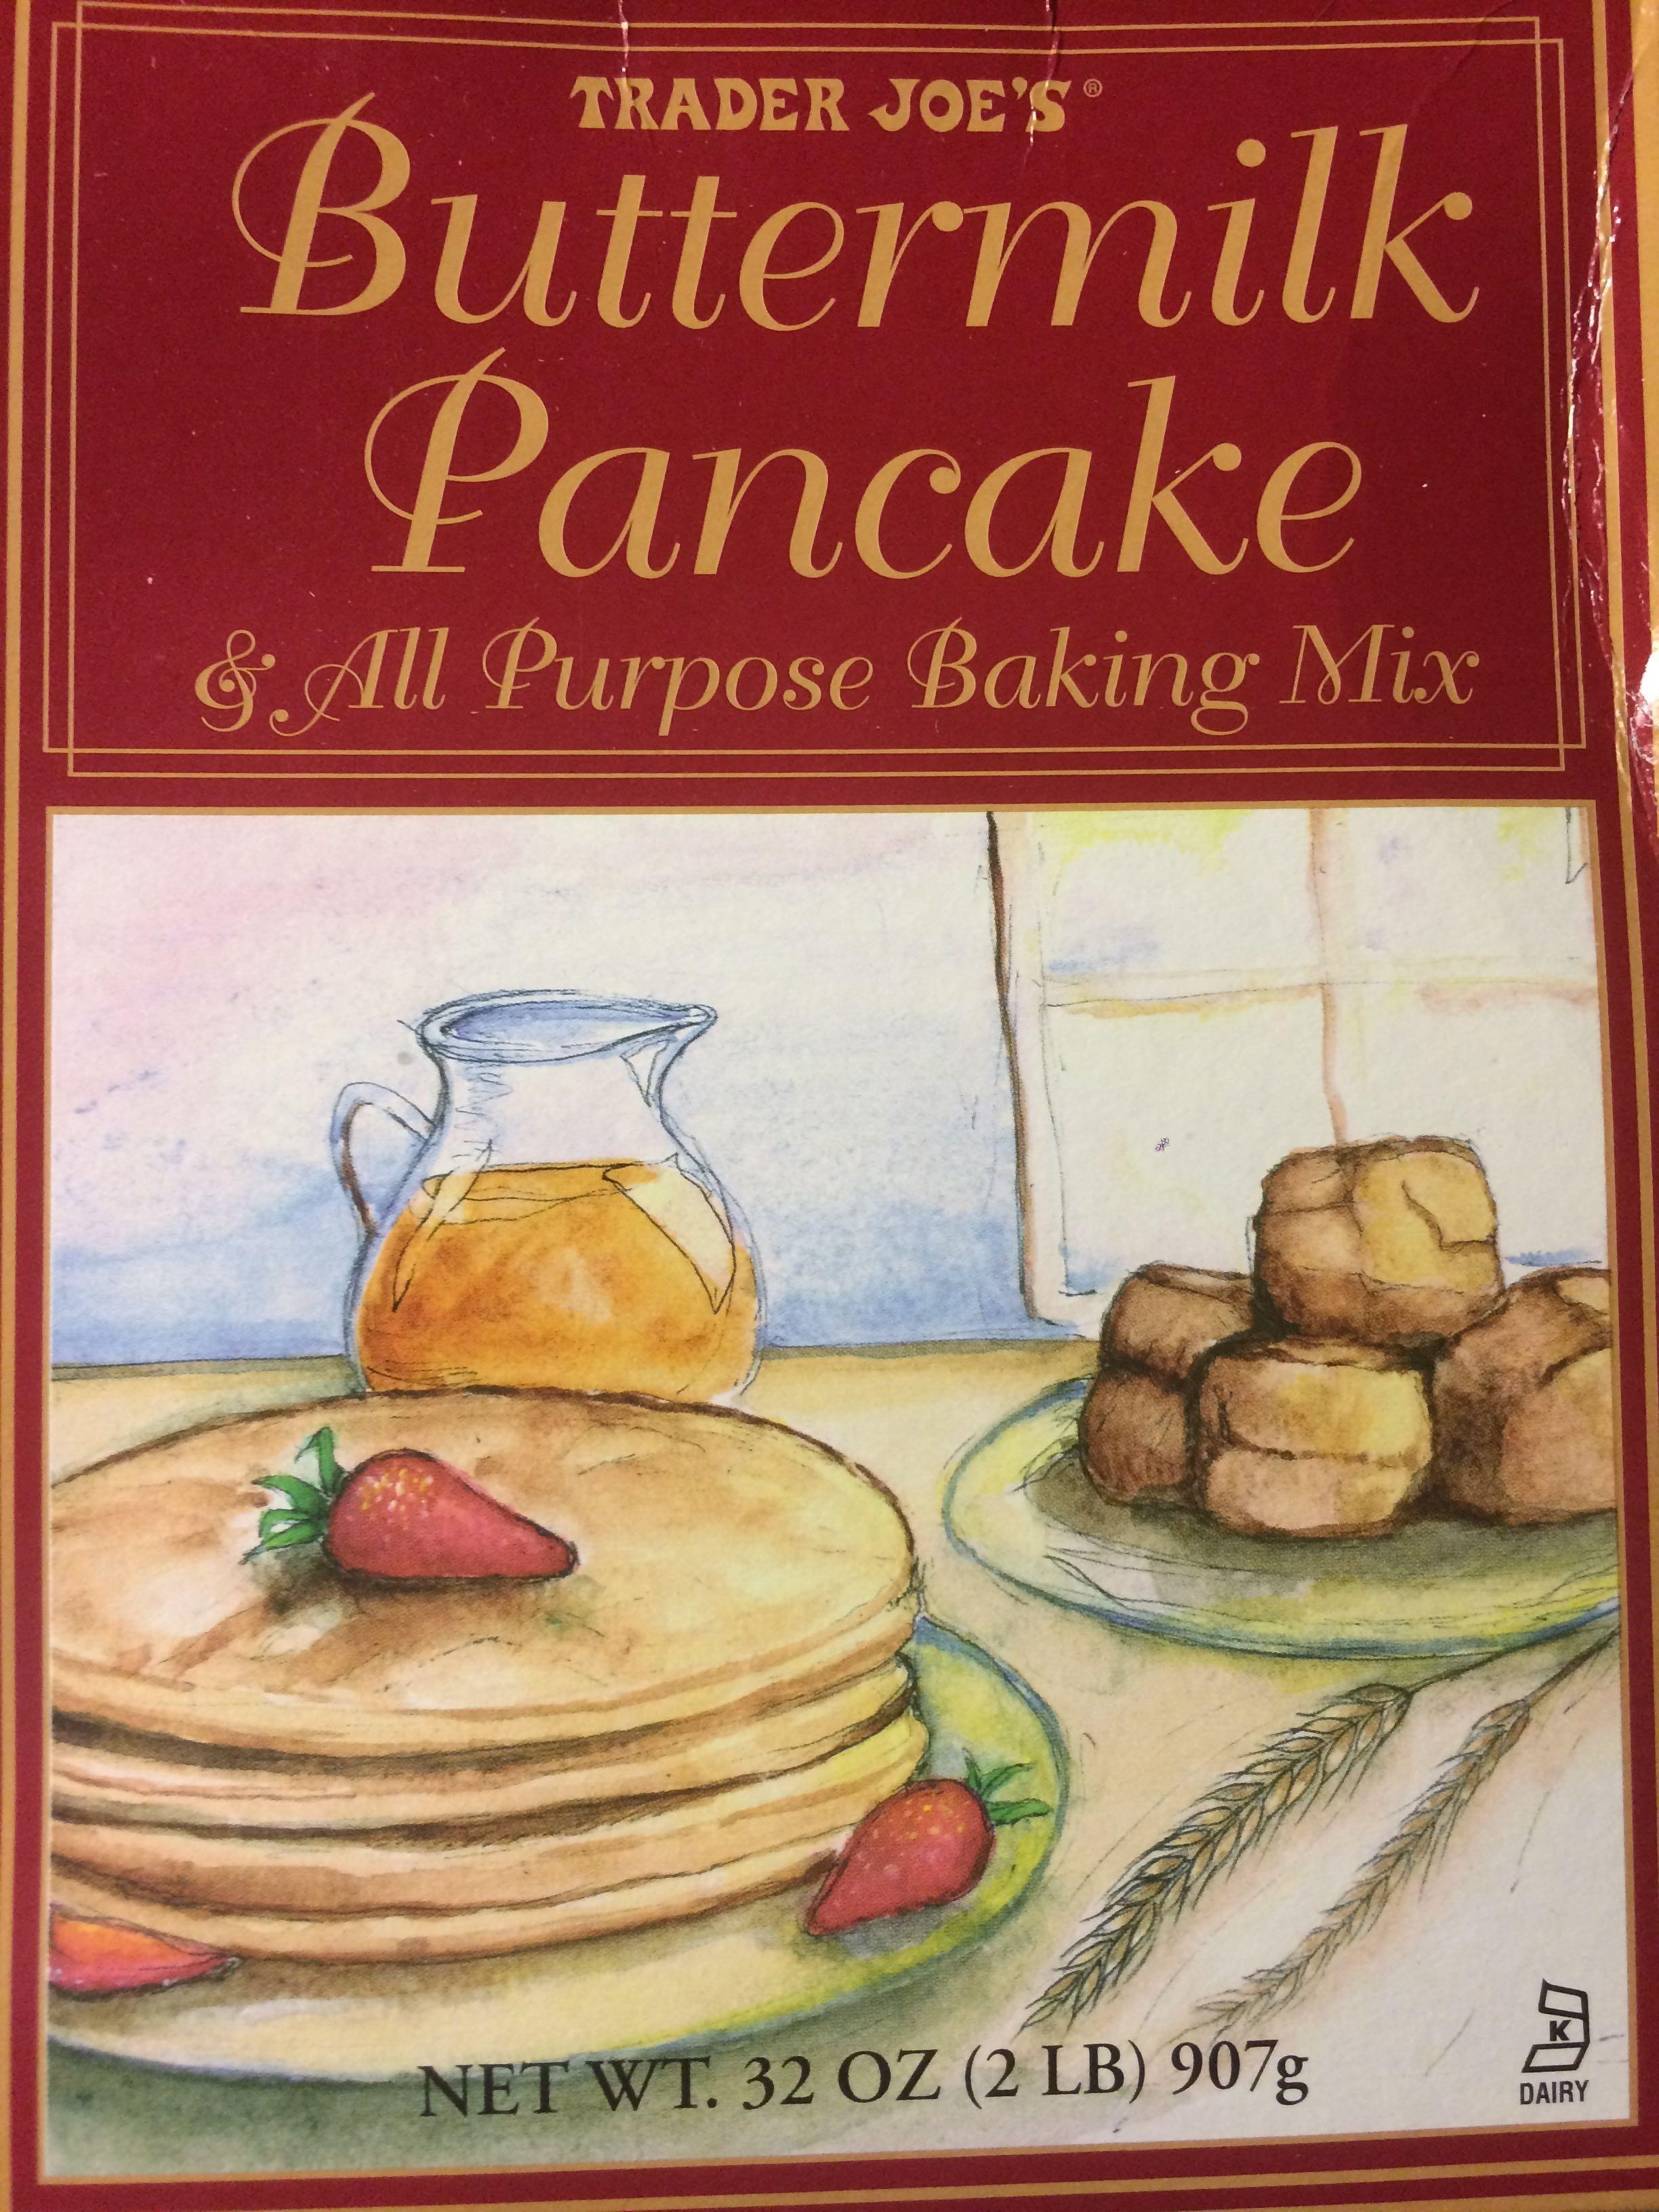 Buttermilk Pancake - Product